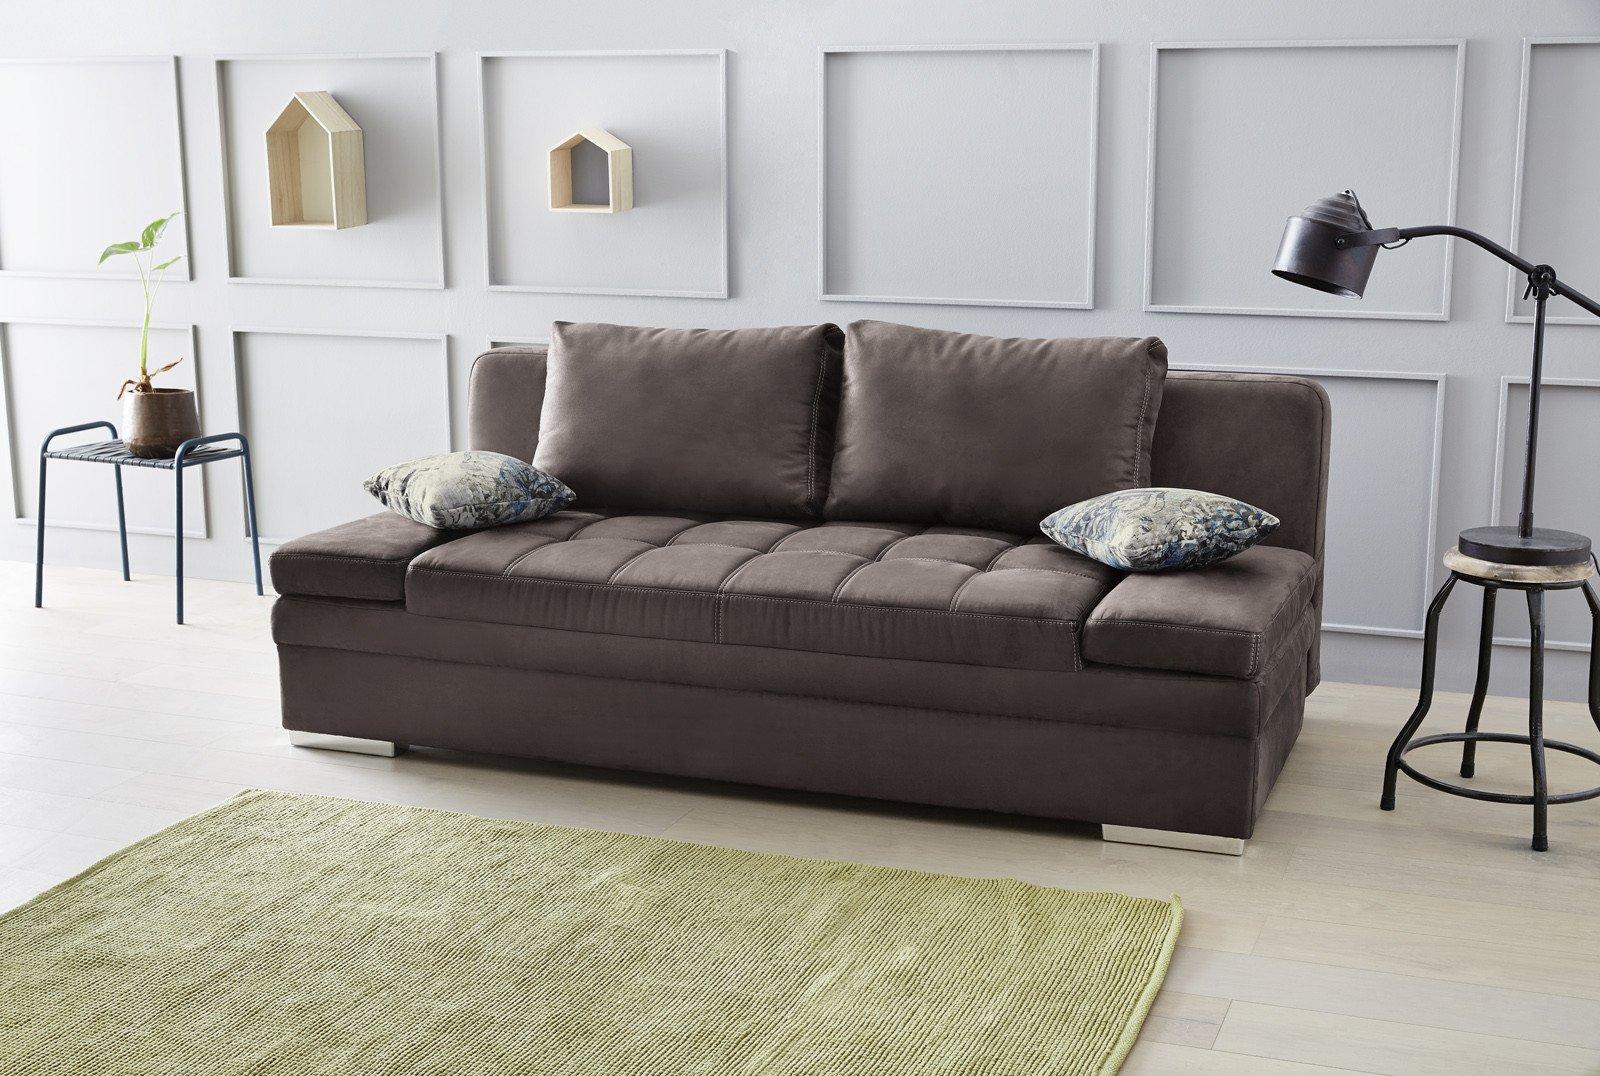 jockenh fer joshua schlafsofa in braun m bel letz ihr online shop. Black Bedroom Furniture Sets. Home Design Ideas